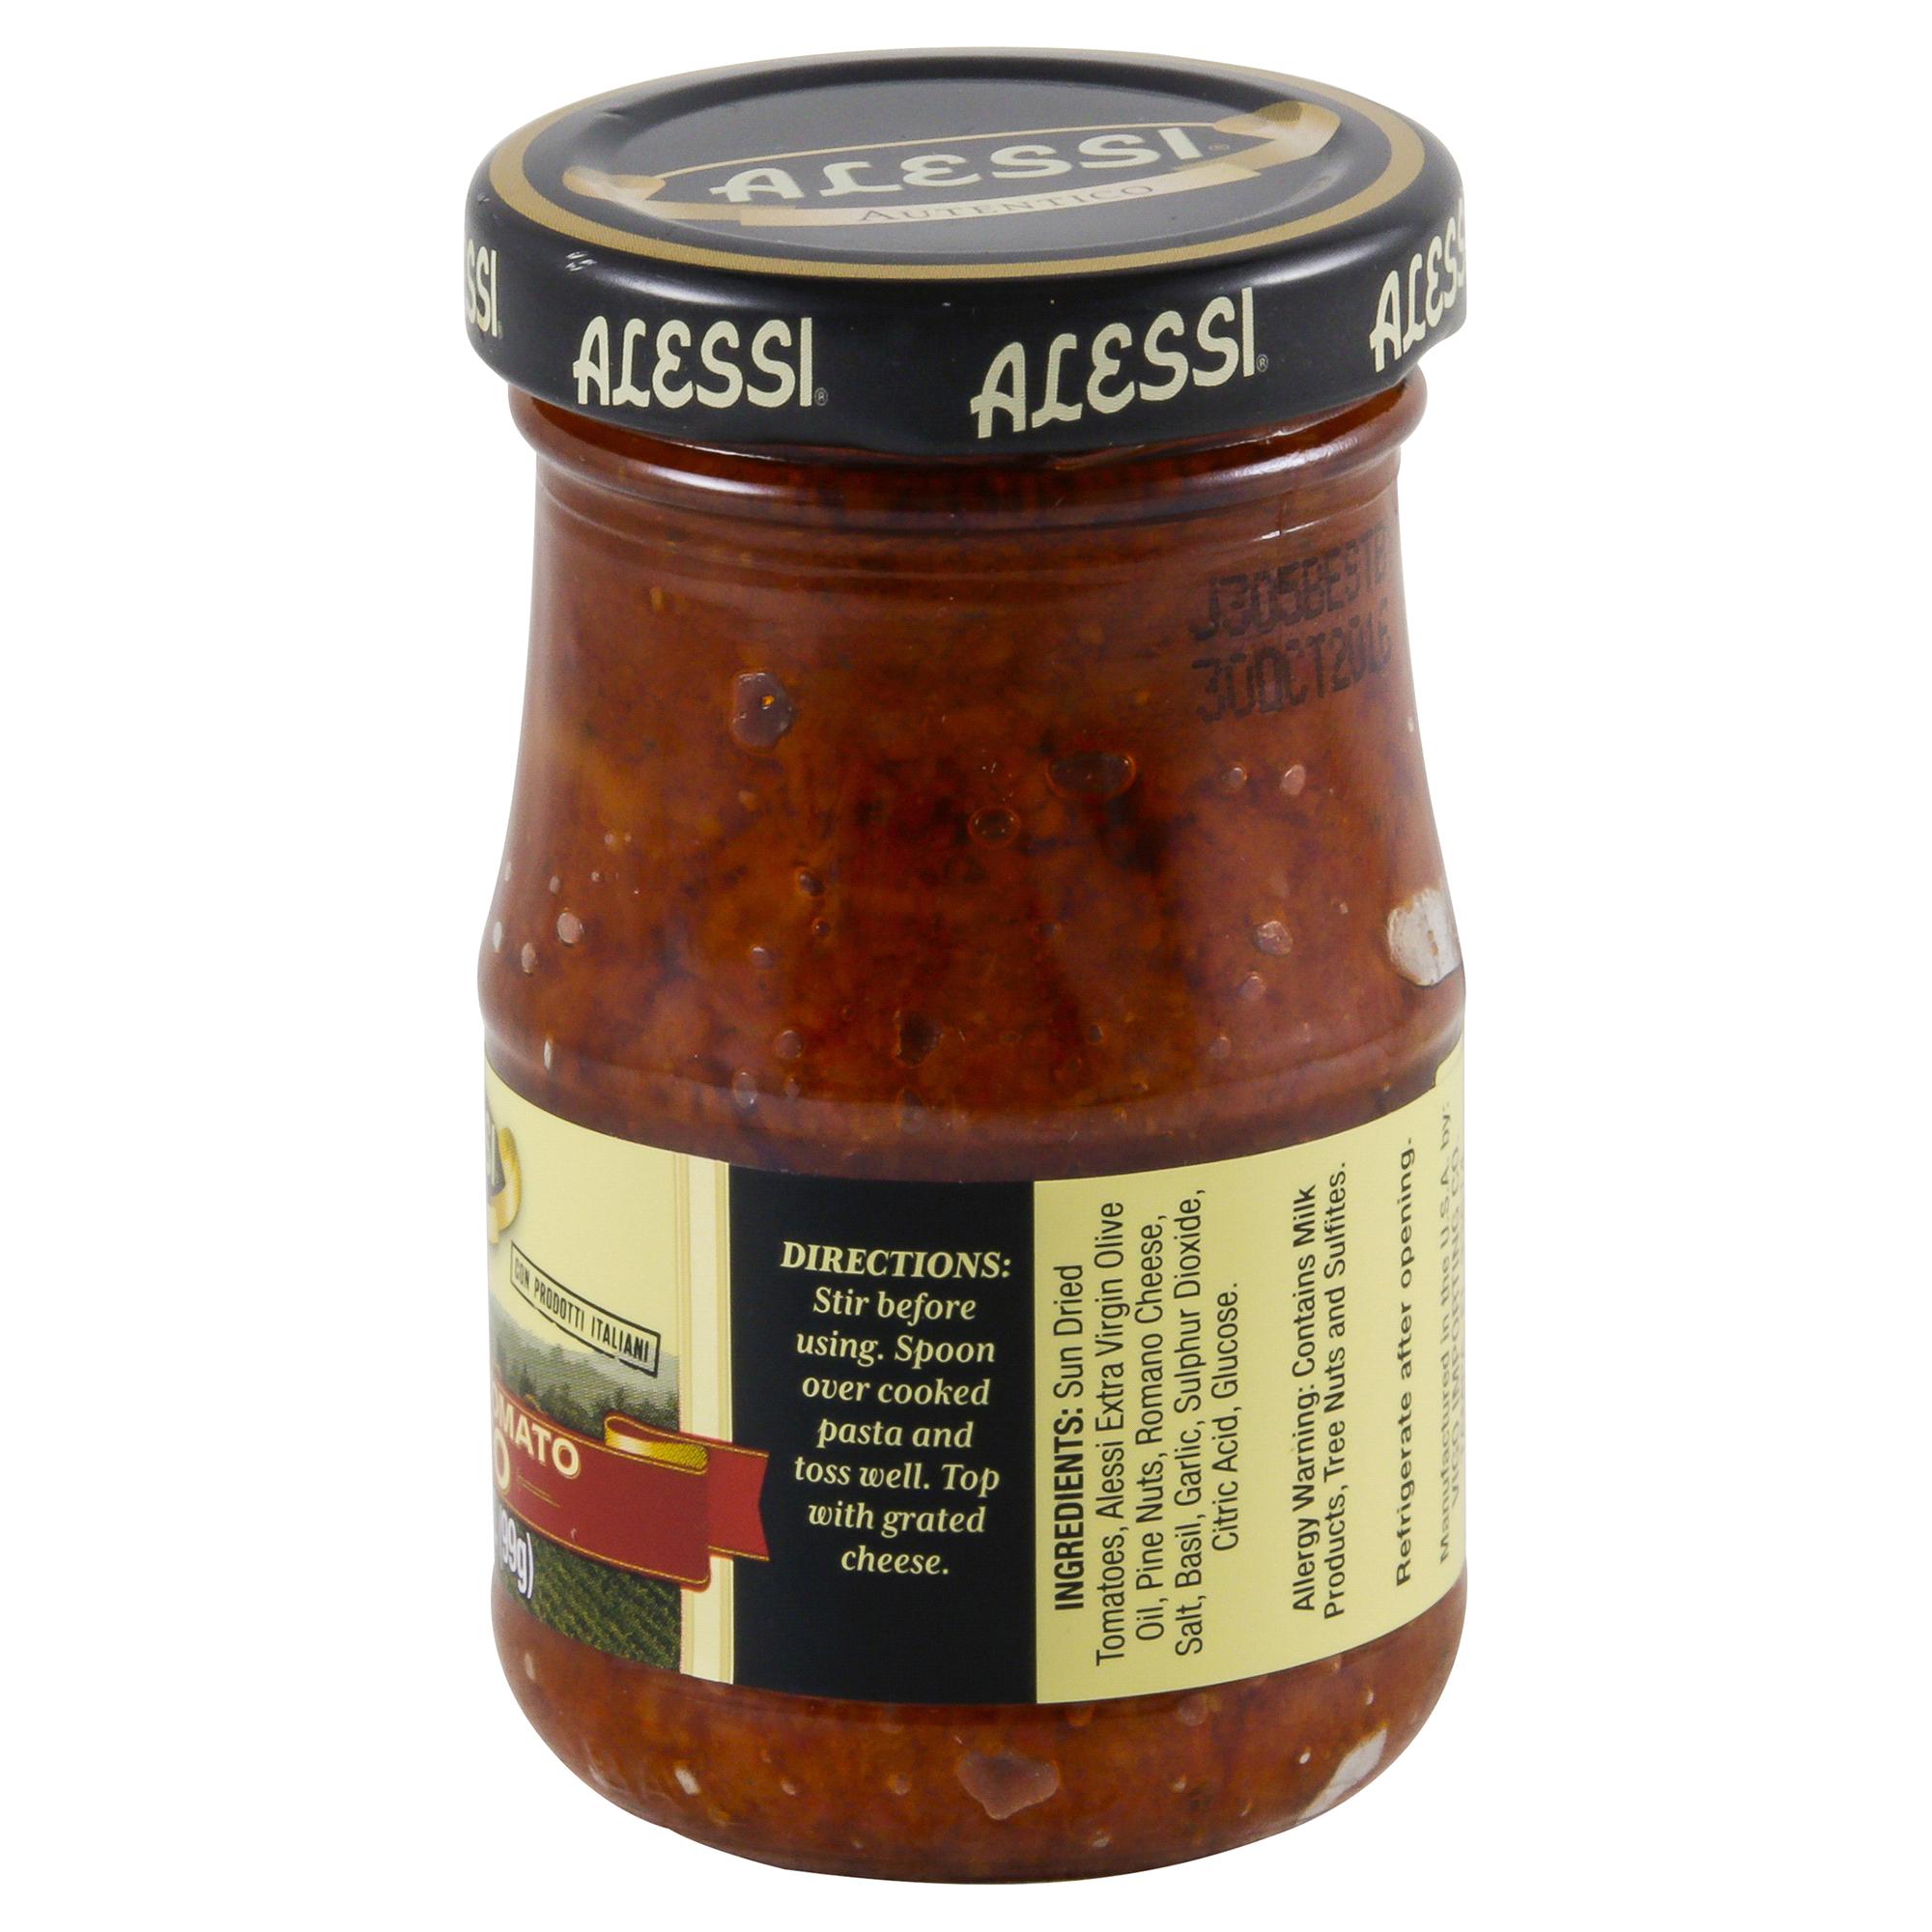 Alessi Sun Dried Tomato Pesto 3.5 oz. | Meijer.com